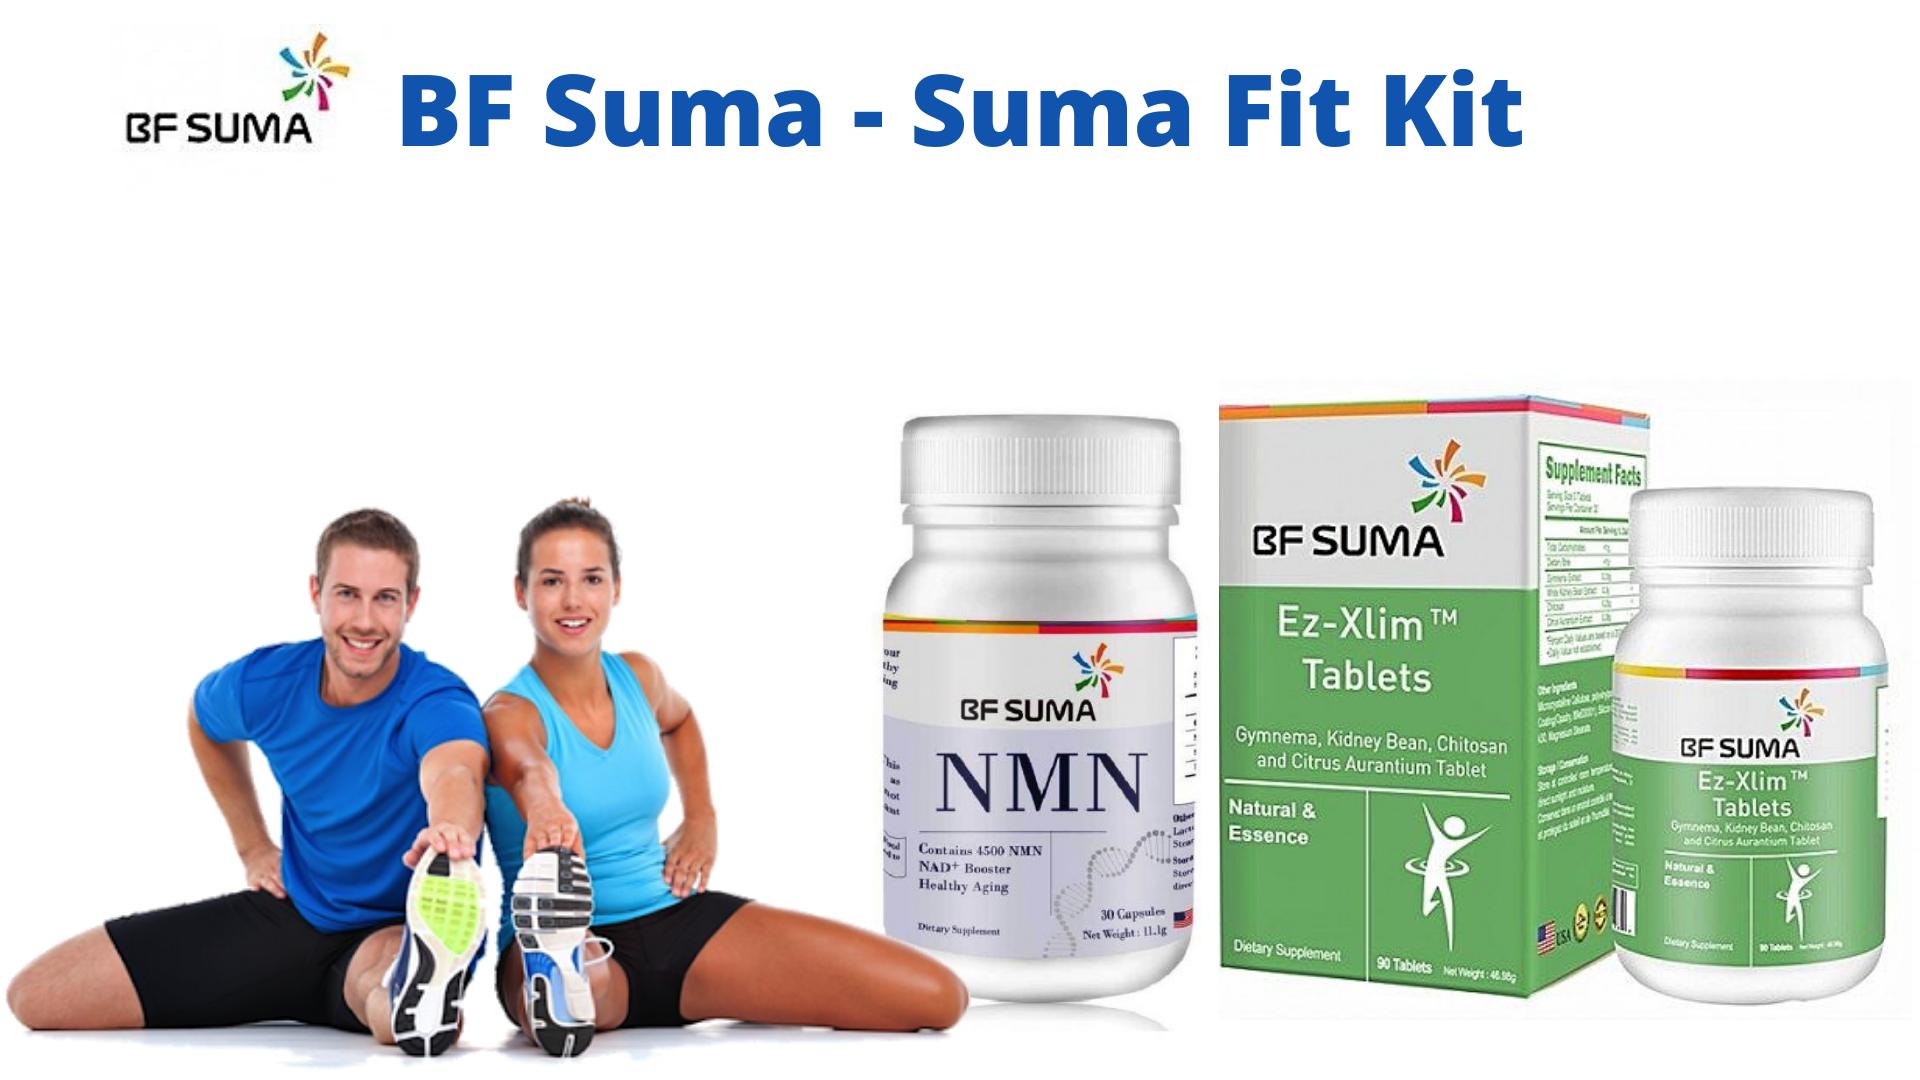 What is BF Suma Suma Fit Kit?